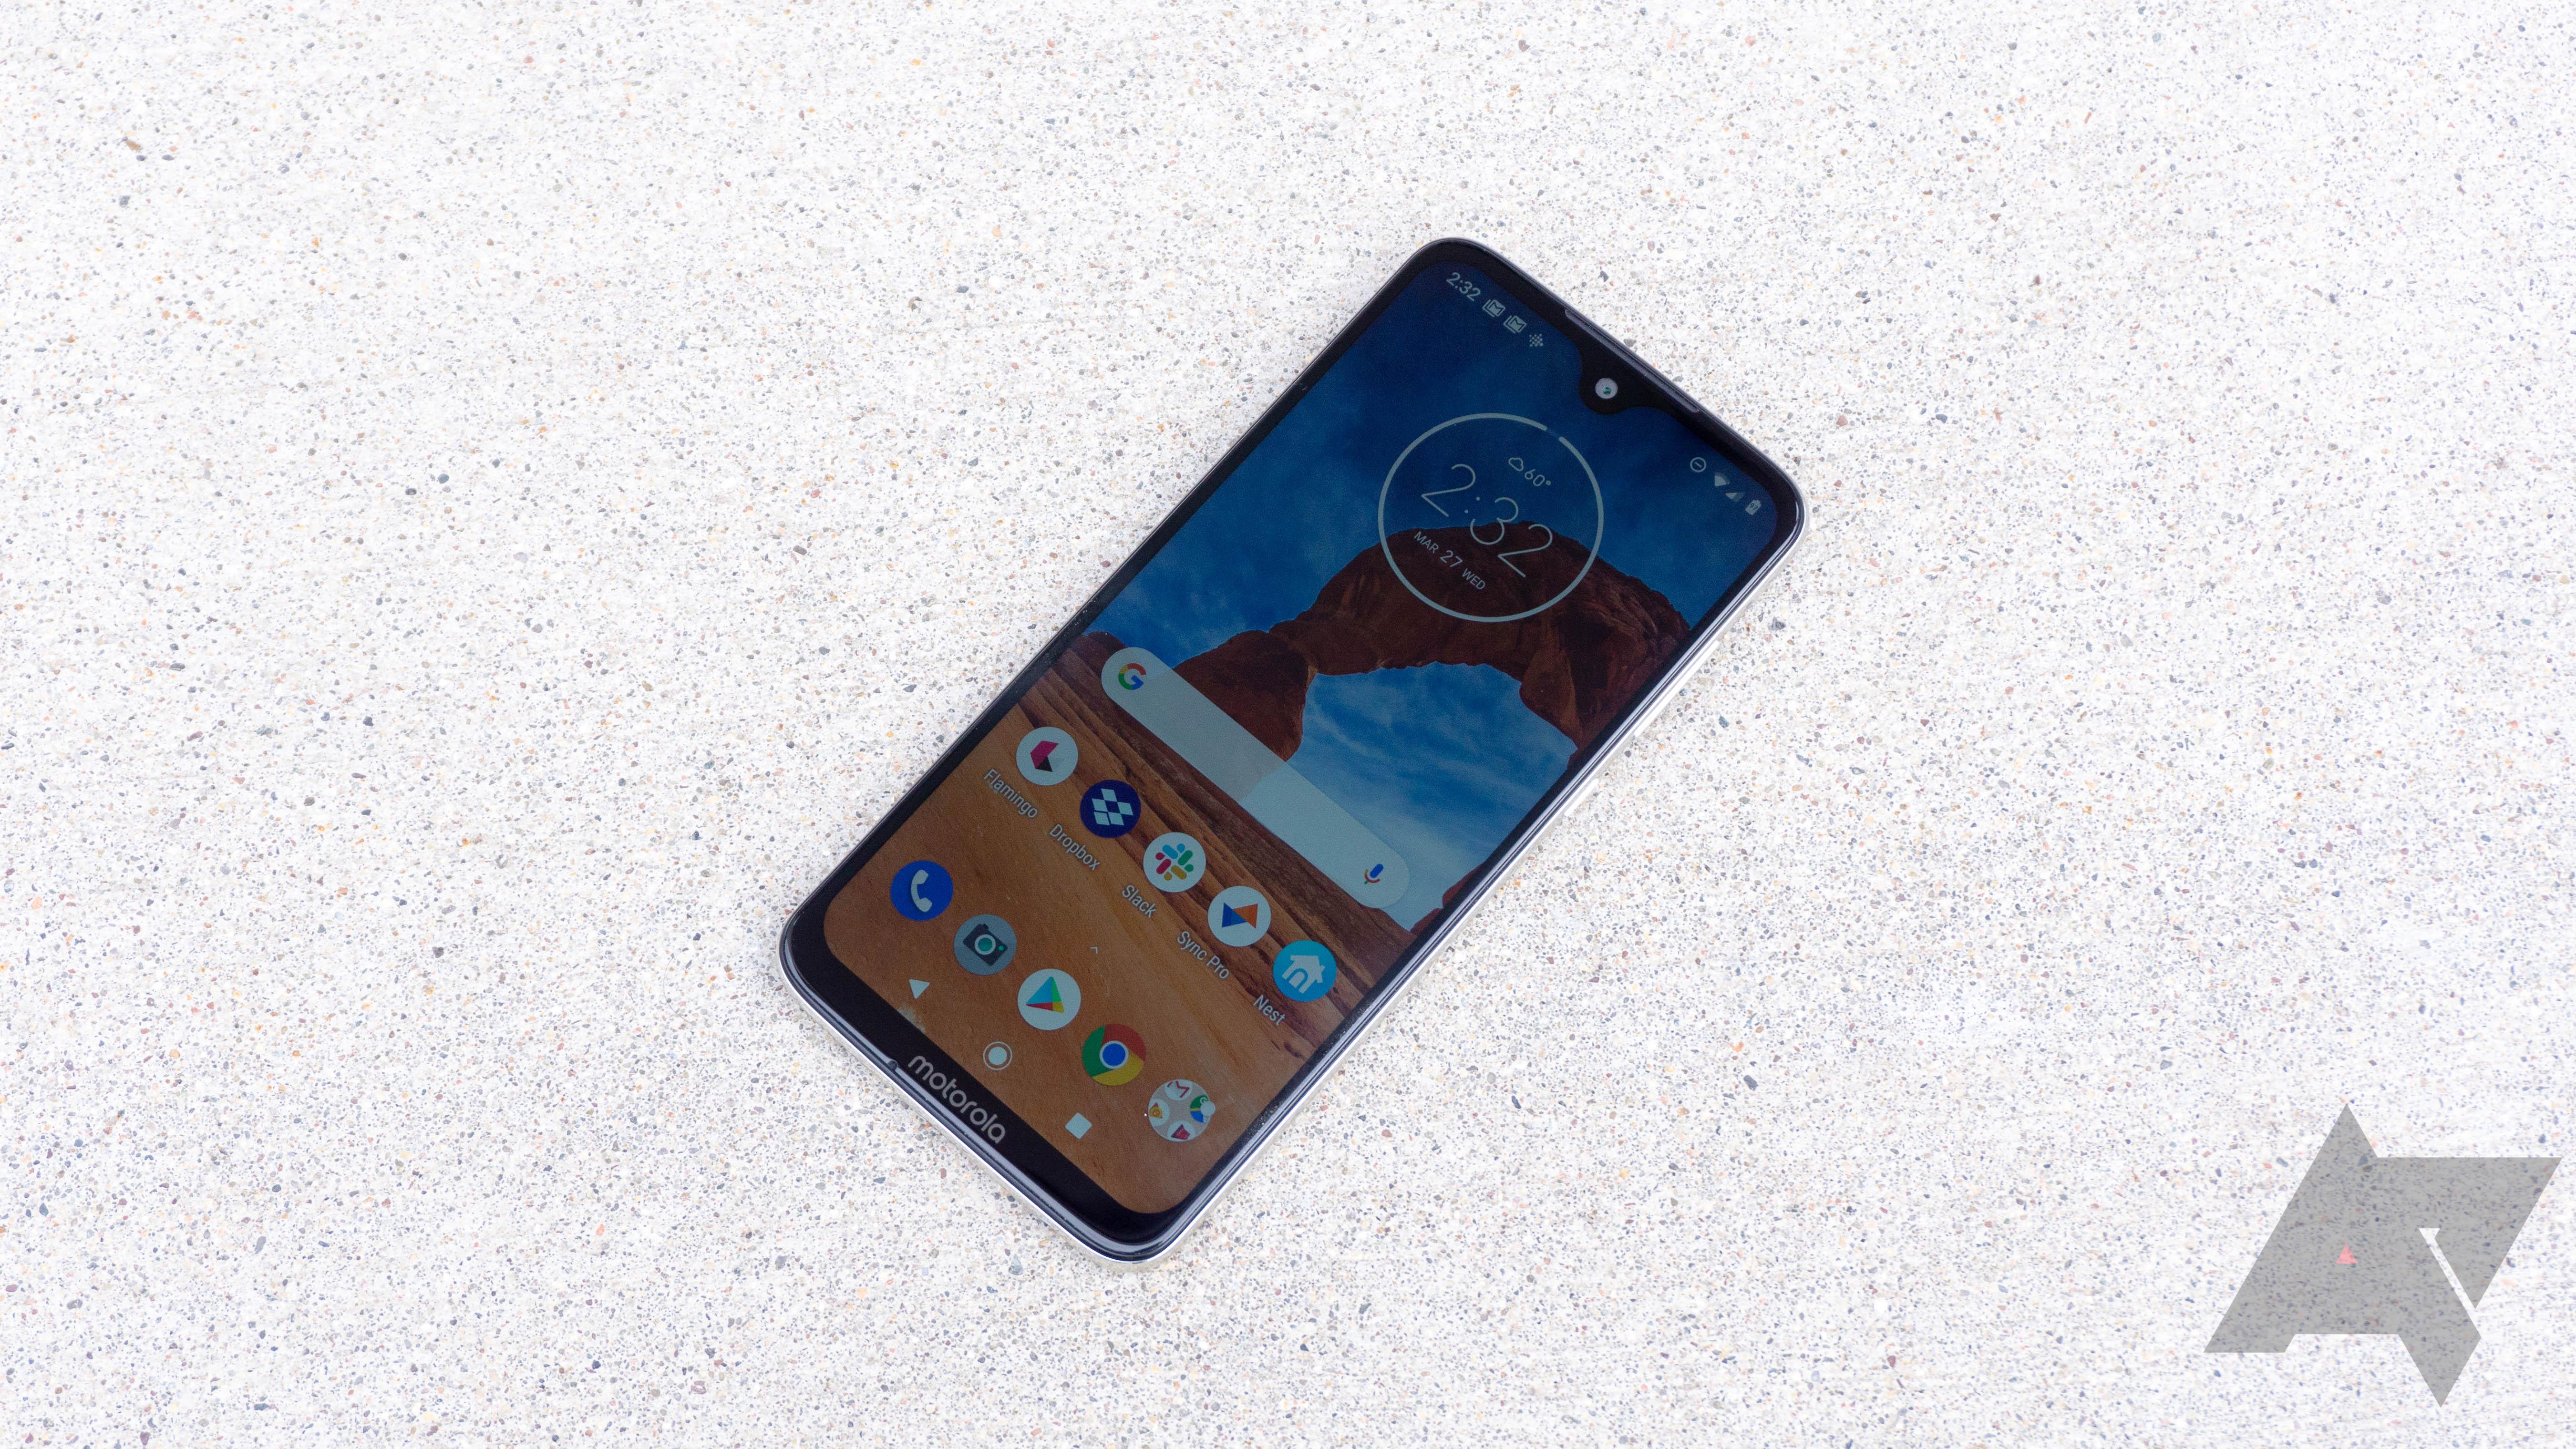 Update: Carrier restrictions] Motorola announces Call Screen